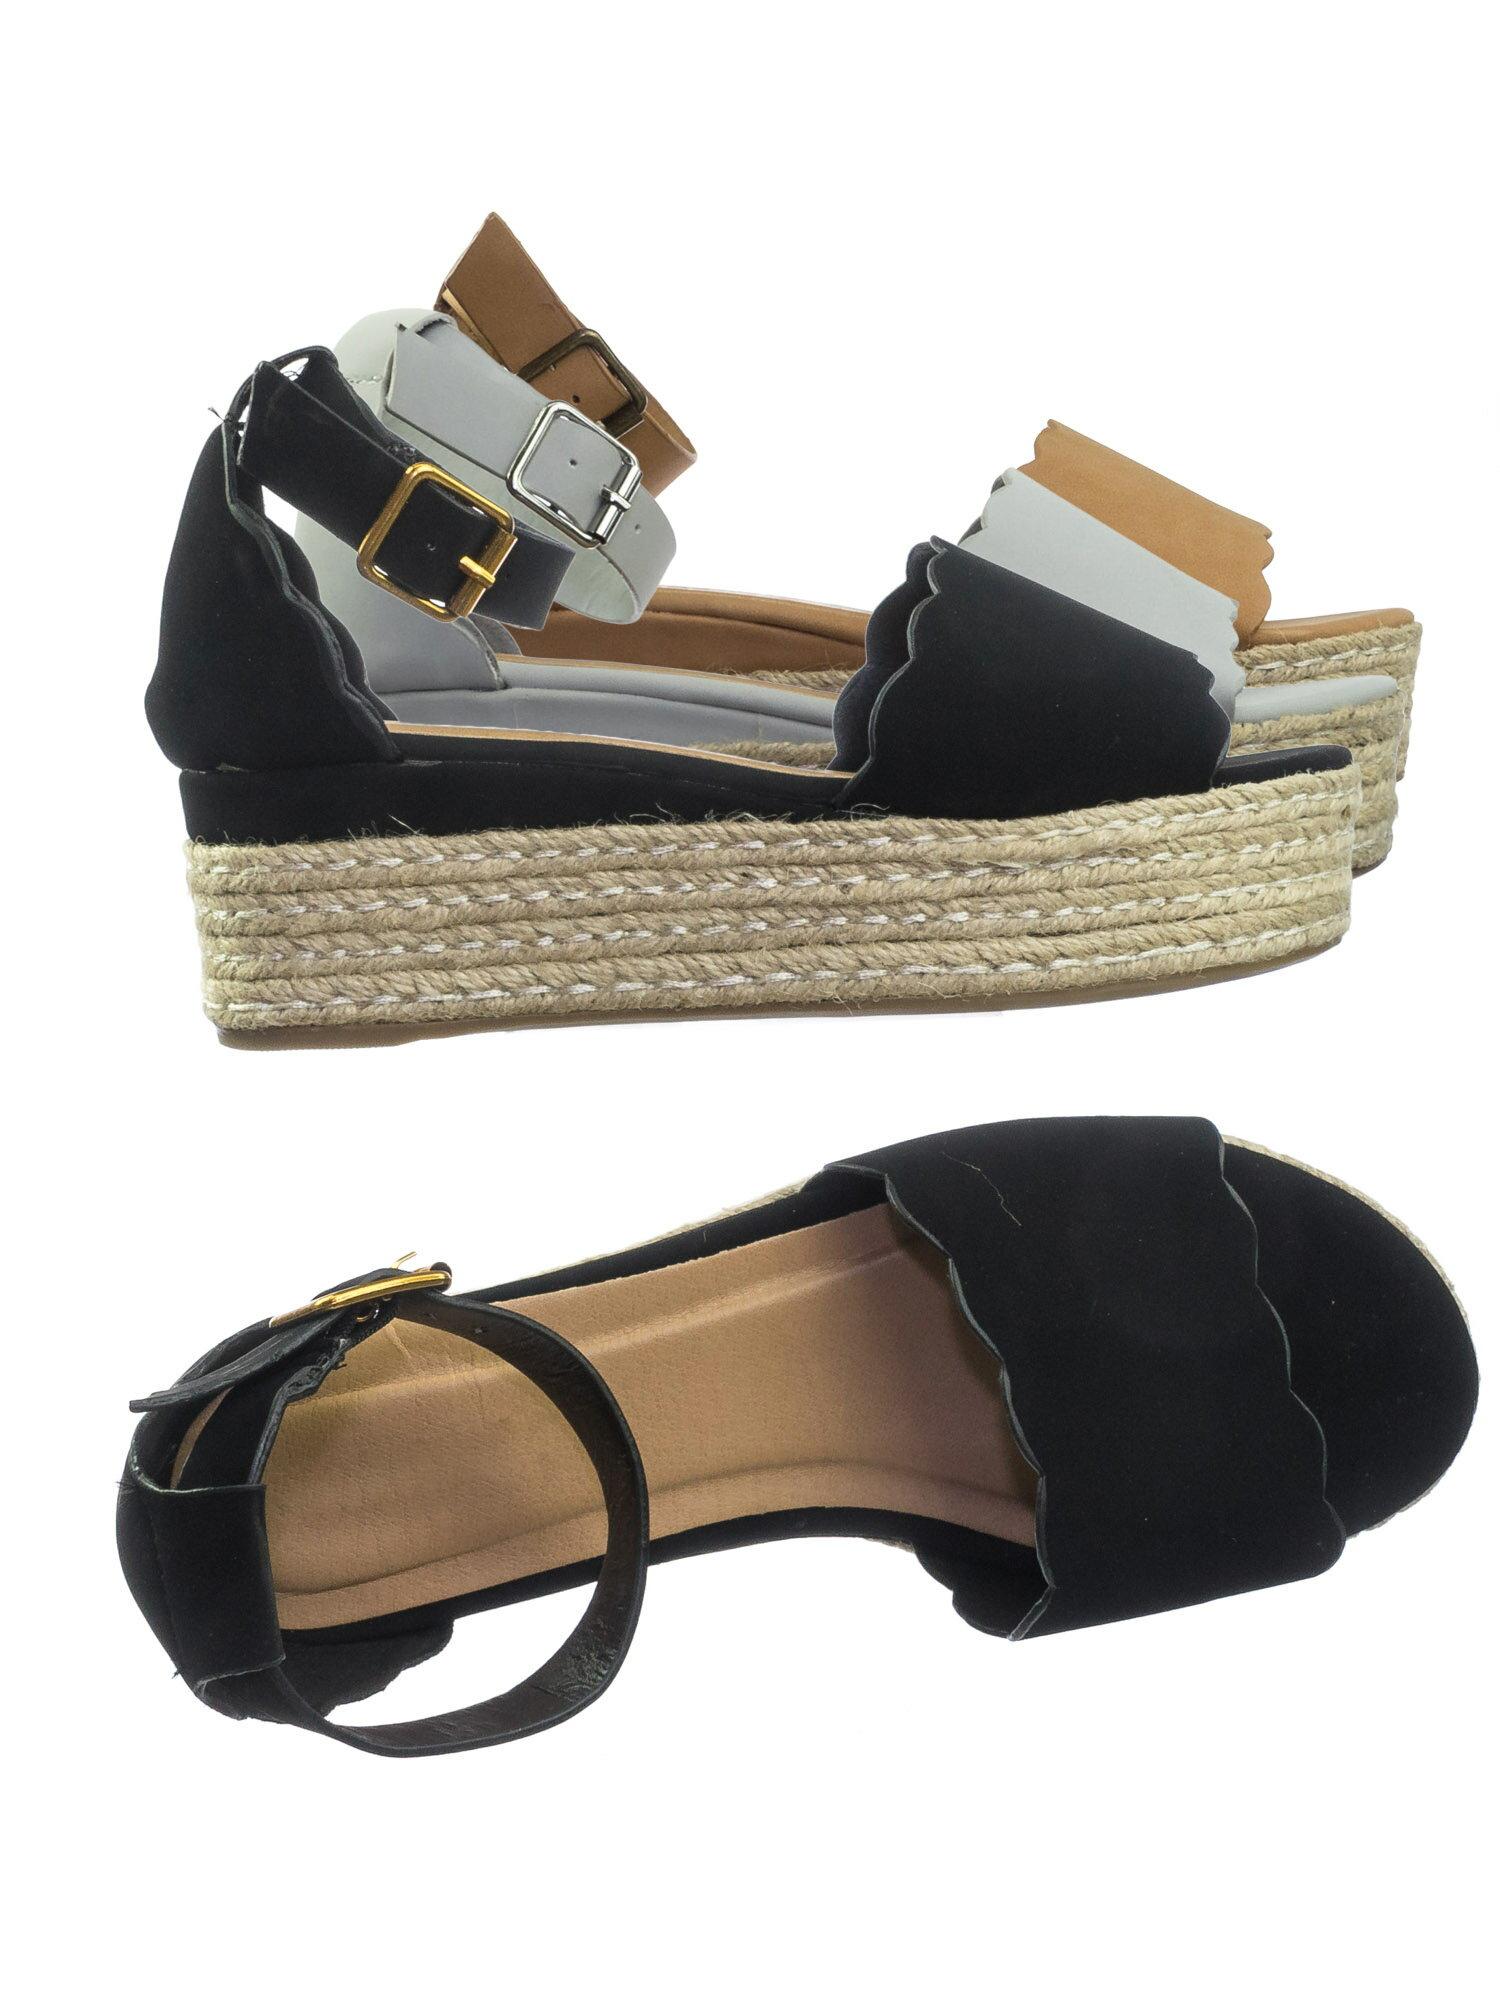 4a614ec18e5 Infinity06 Black Nubuck by Bamboo Scallop Espadrille Jute Rope Wrap  Platform Flatform Flat Sandal 0